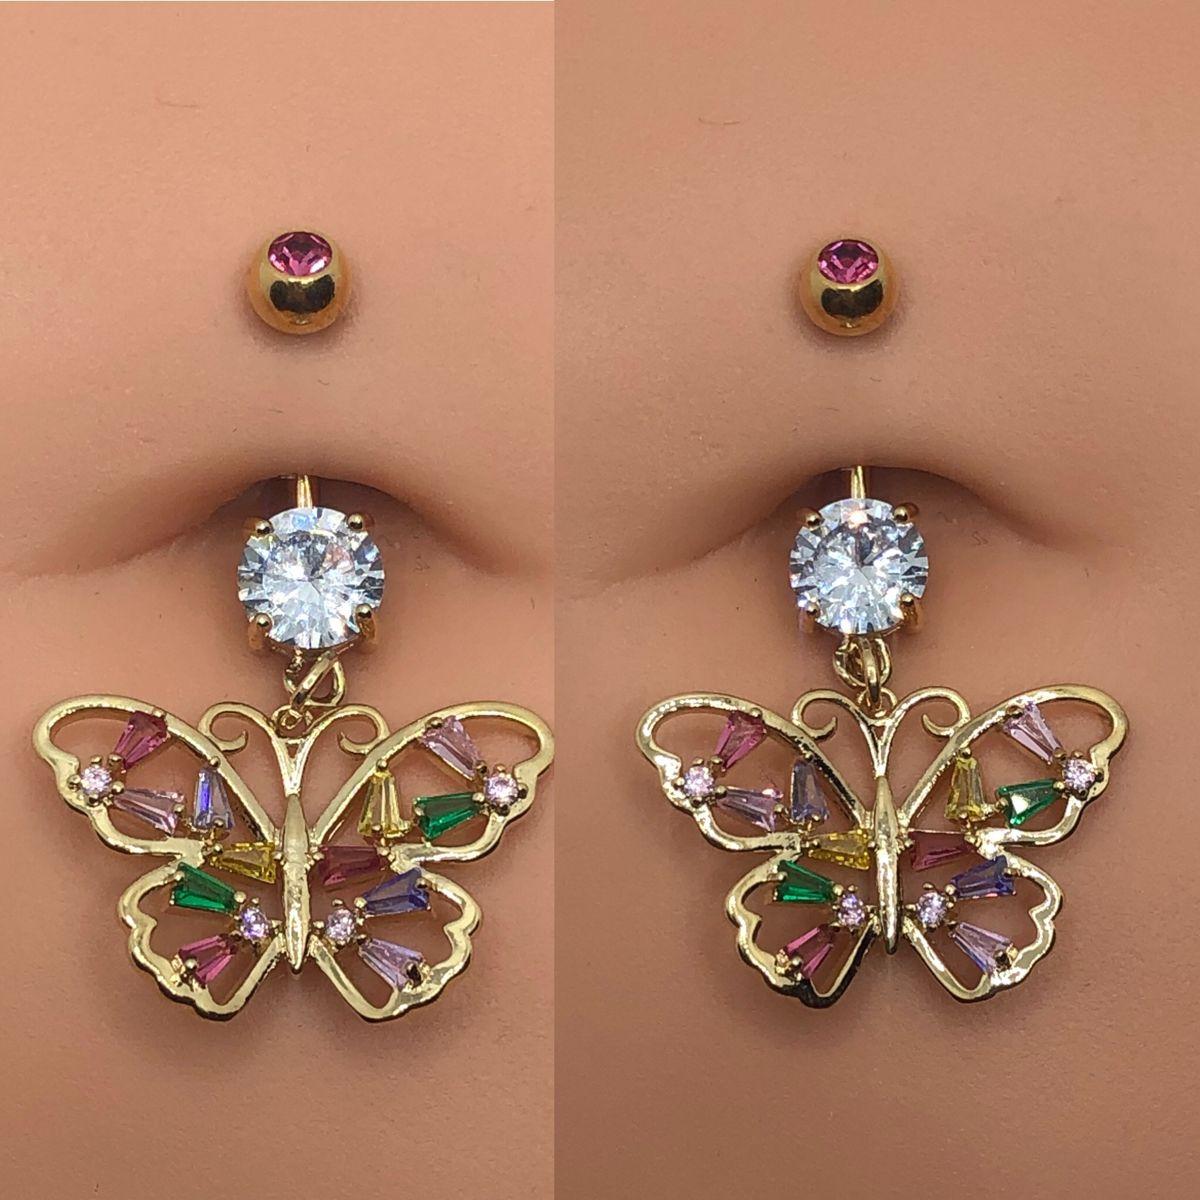 #bellybuttonpiercing #piercing #piercingideas #piercingaddict #piercingaesthetic #butterfly